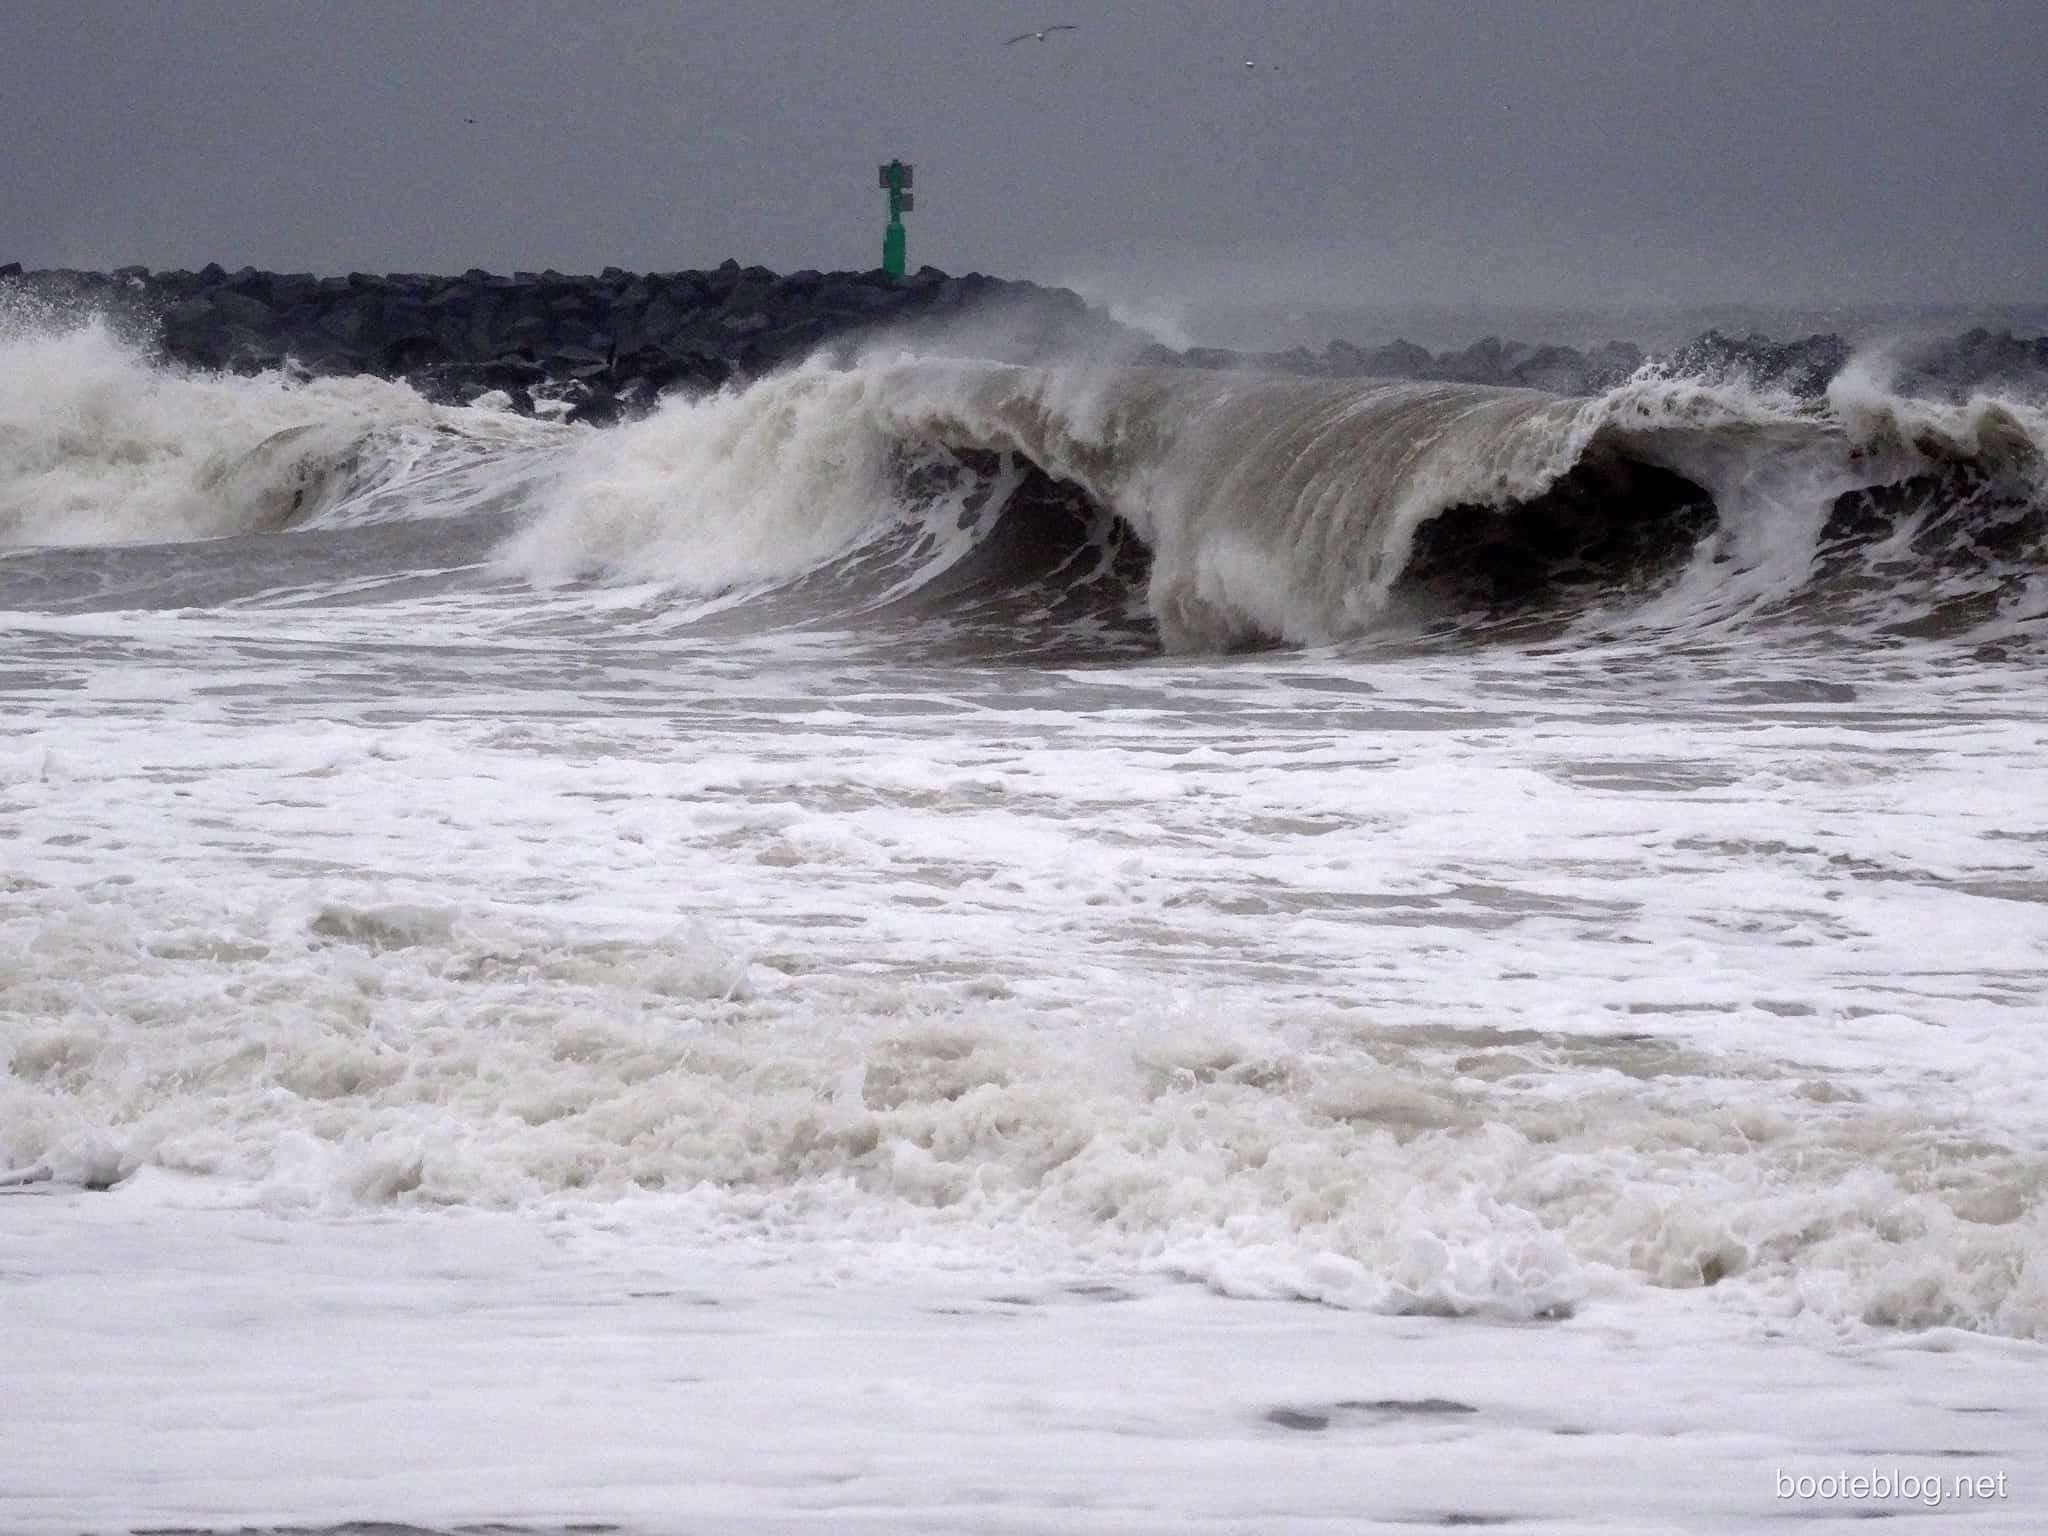 Schweres Wetter, hohe Wellen - schon kommt die Angst vor Seekranktheit